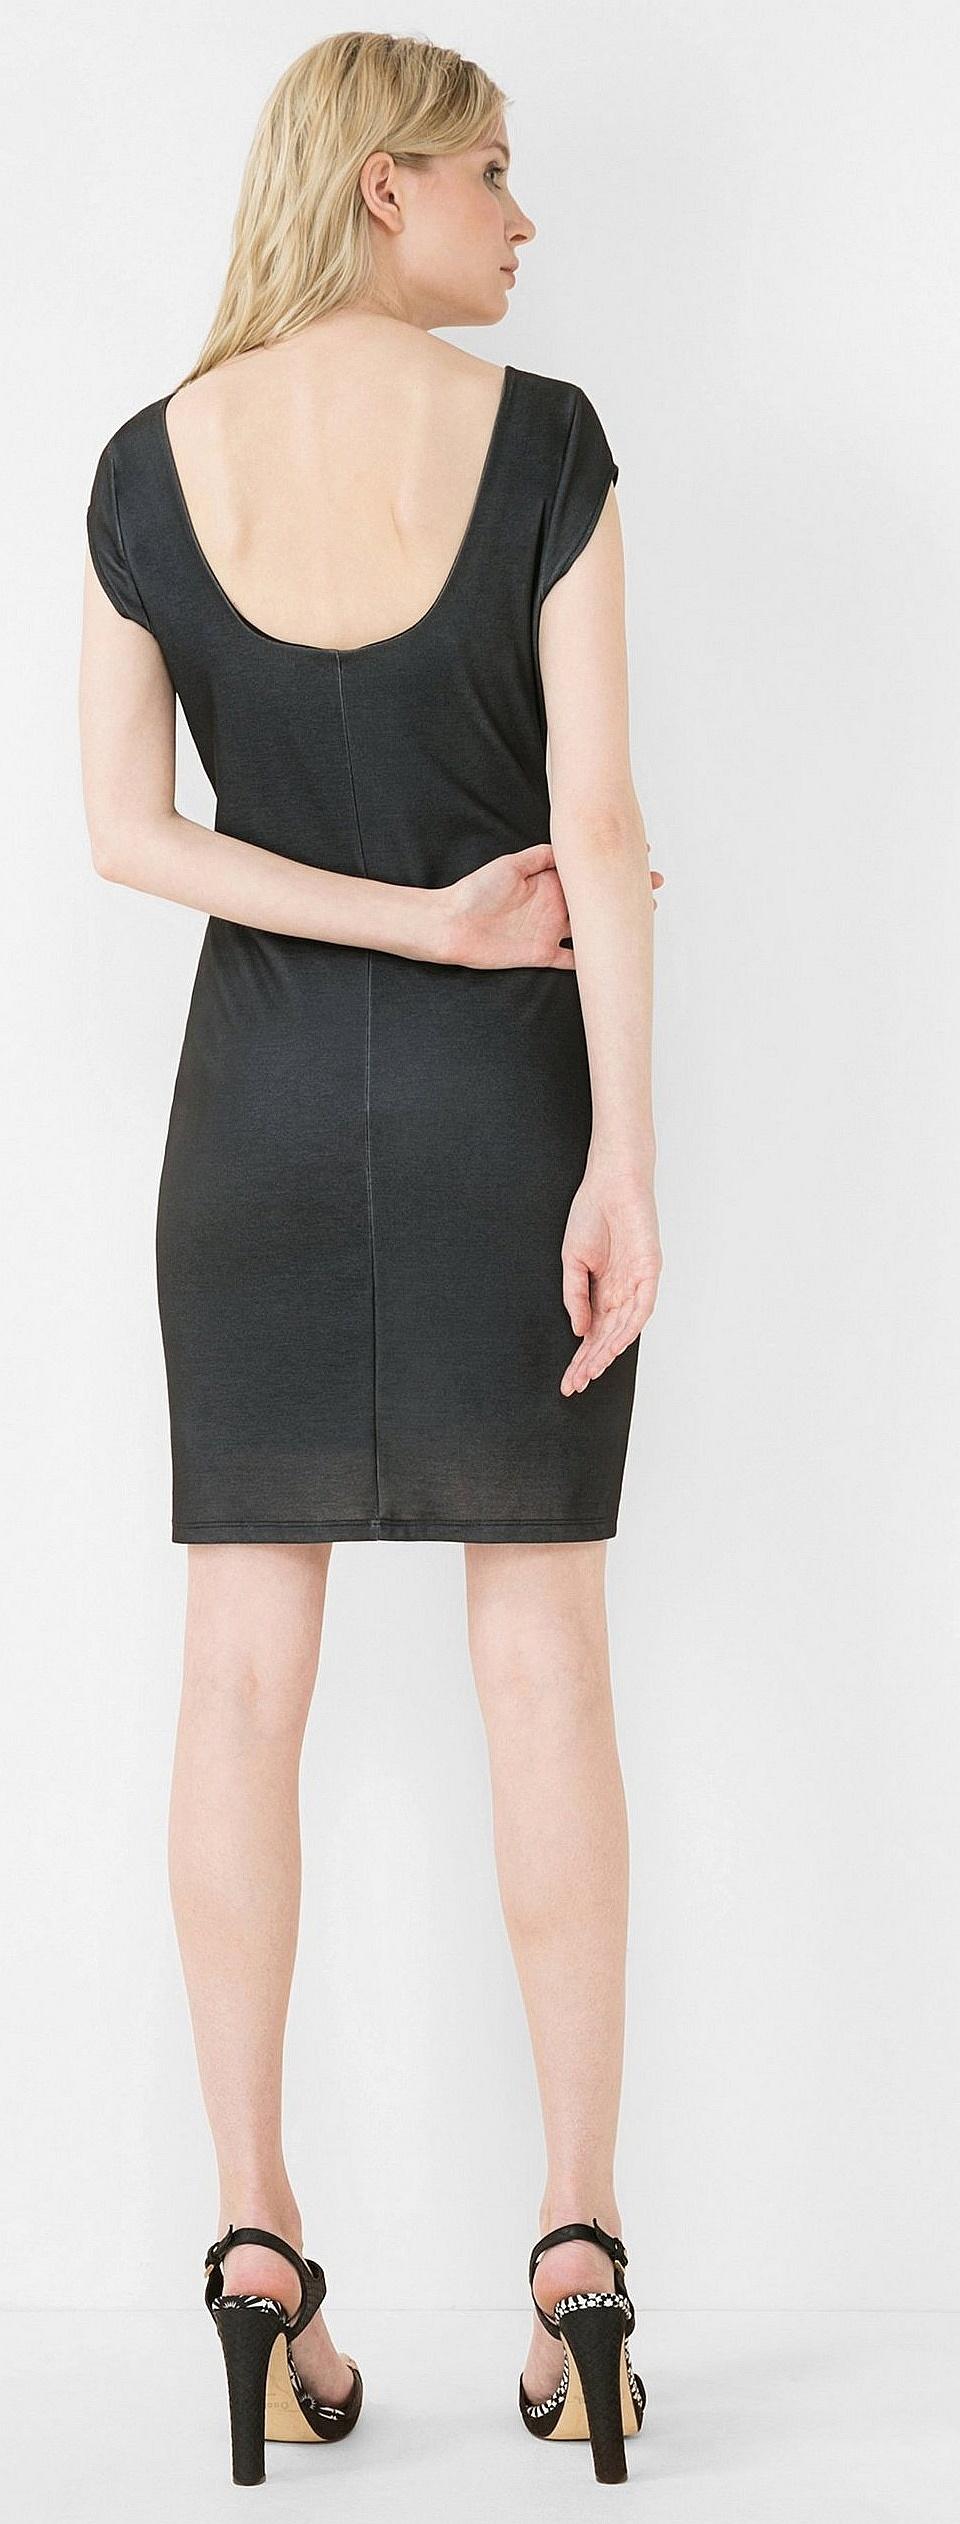 šaty Desigual 67V20X2/Pichi Electra